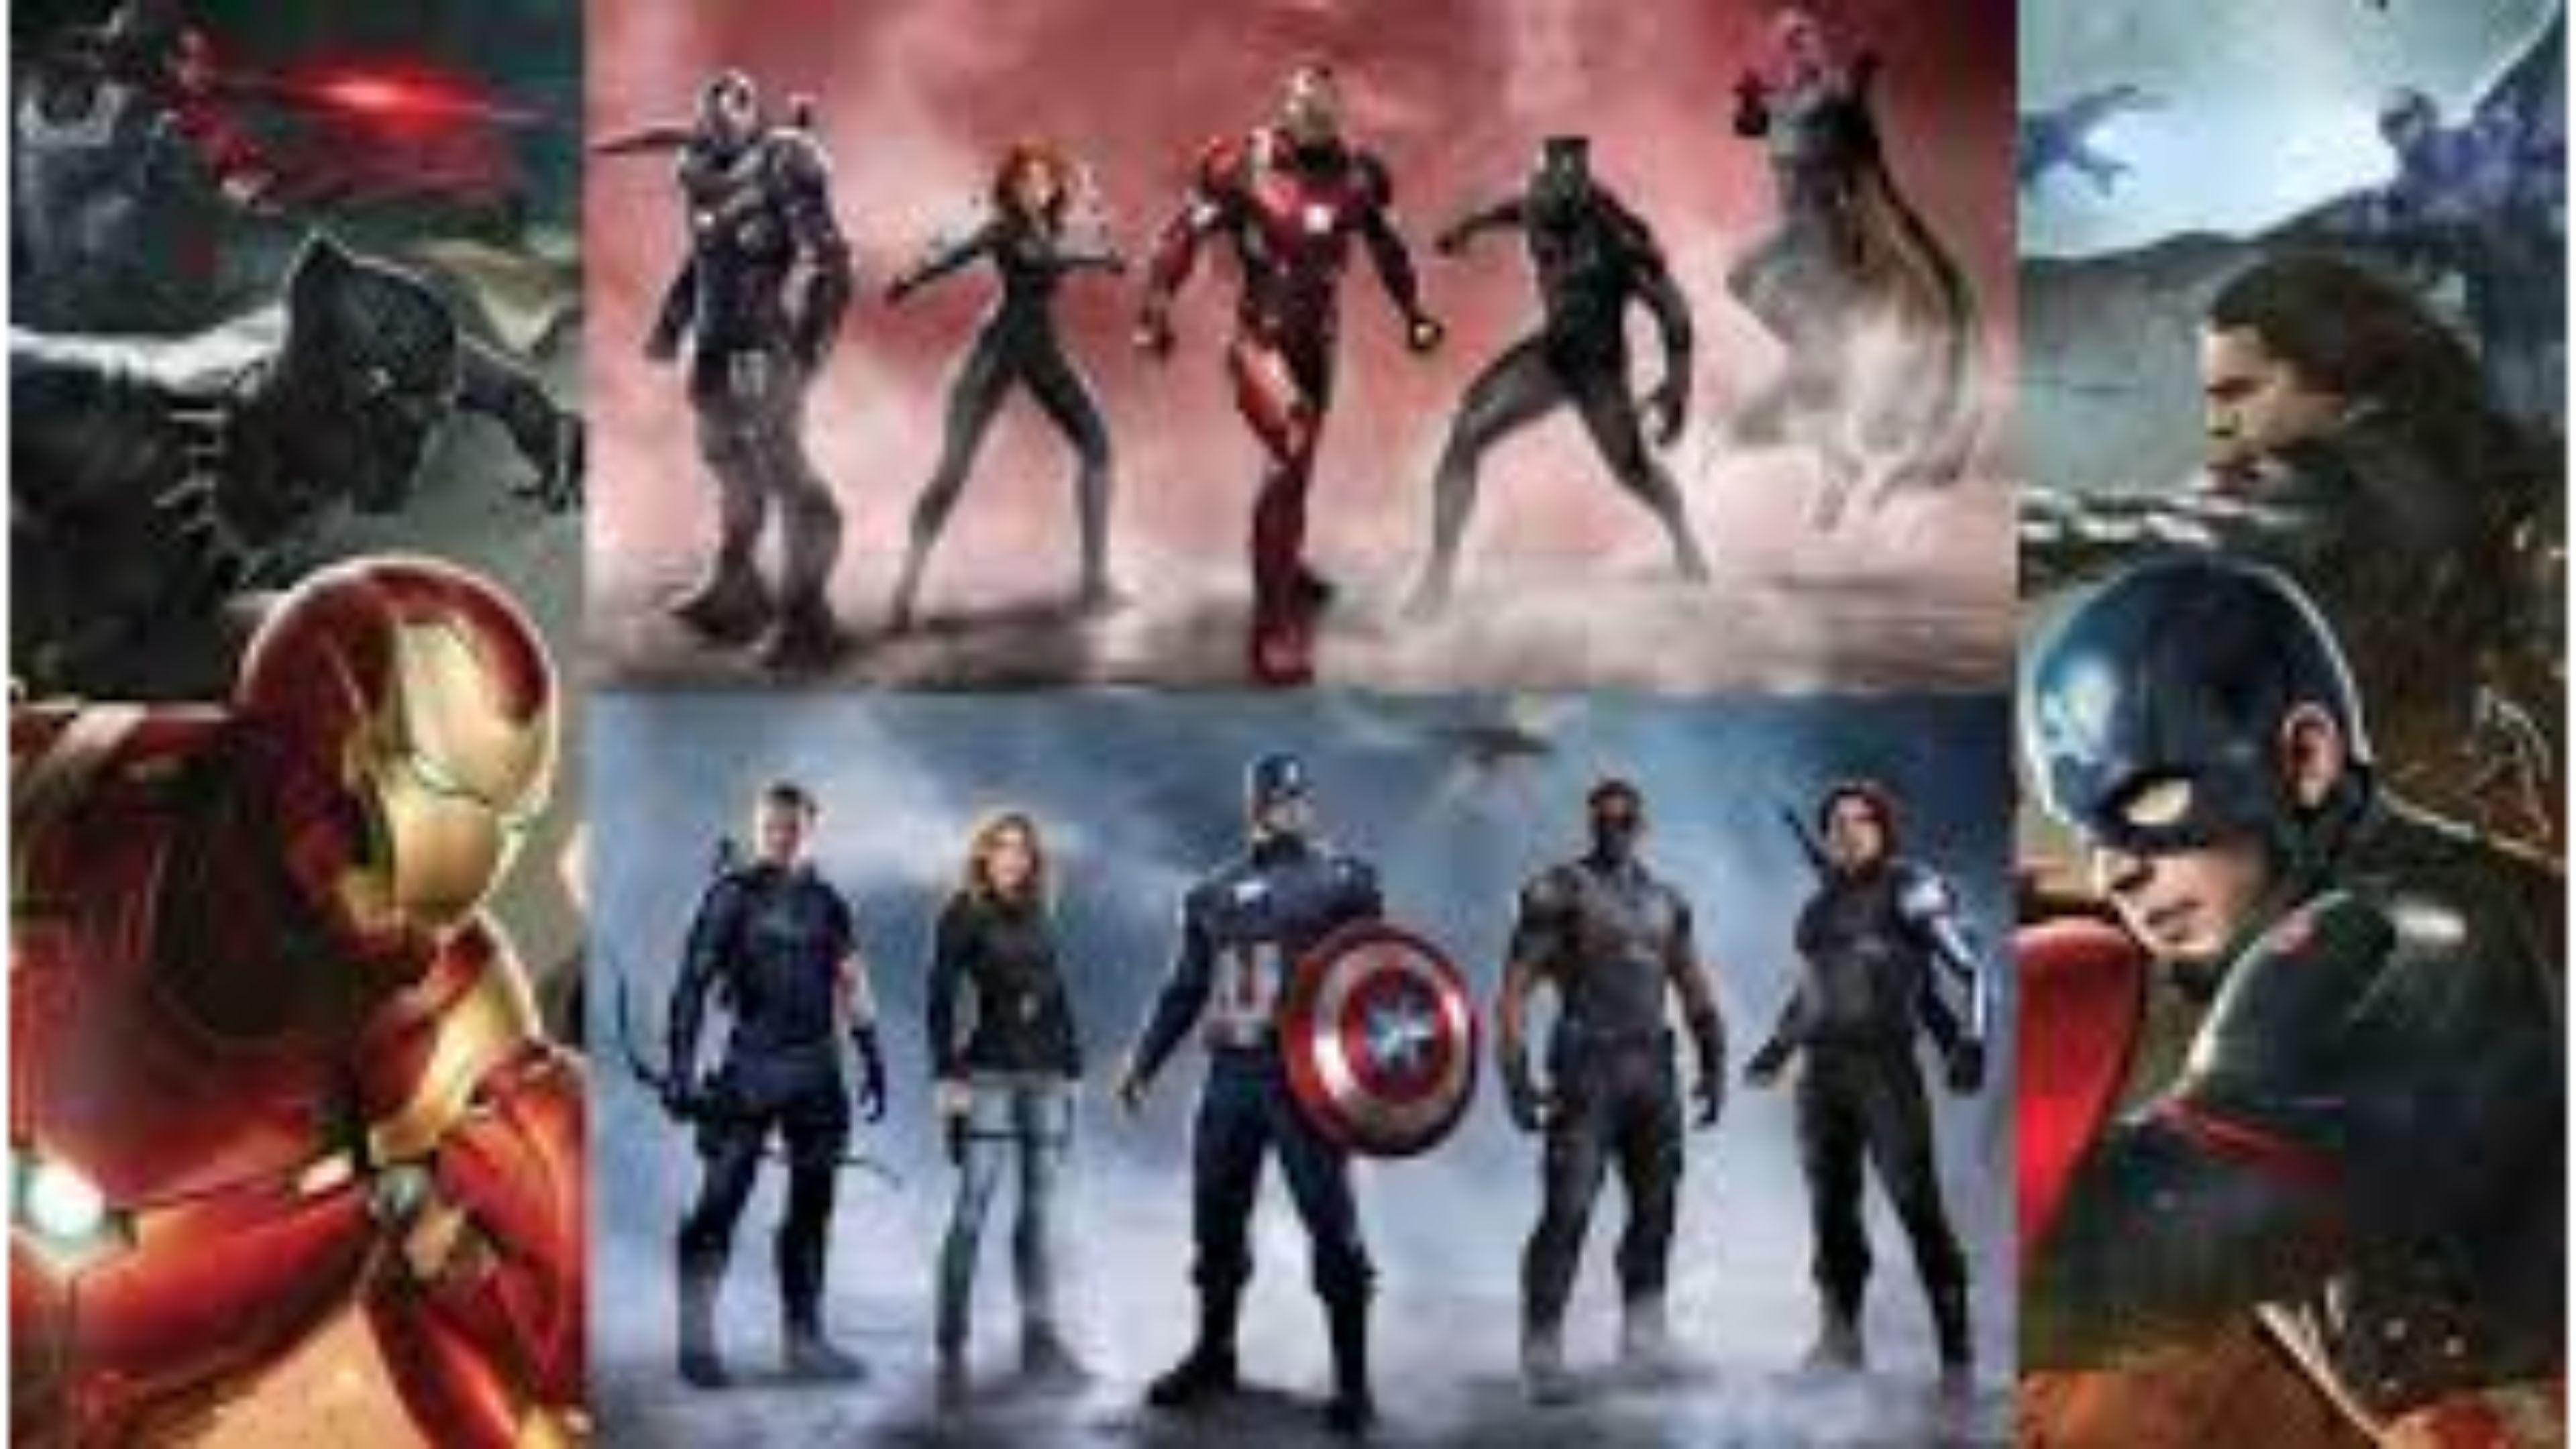 captain america civil war concept hd desktop wallpaper | wallpapers